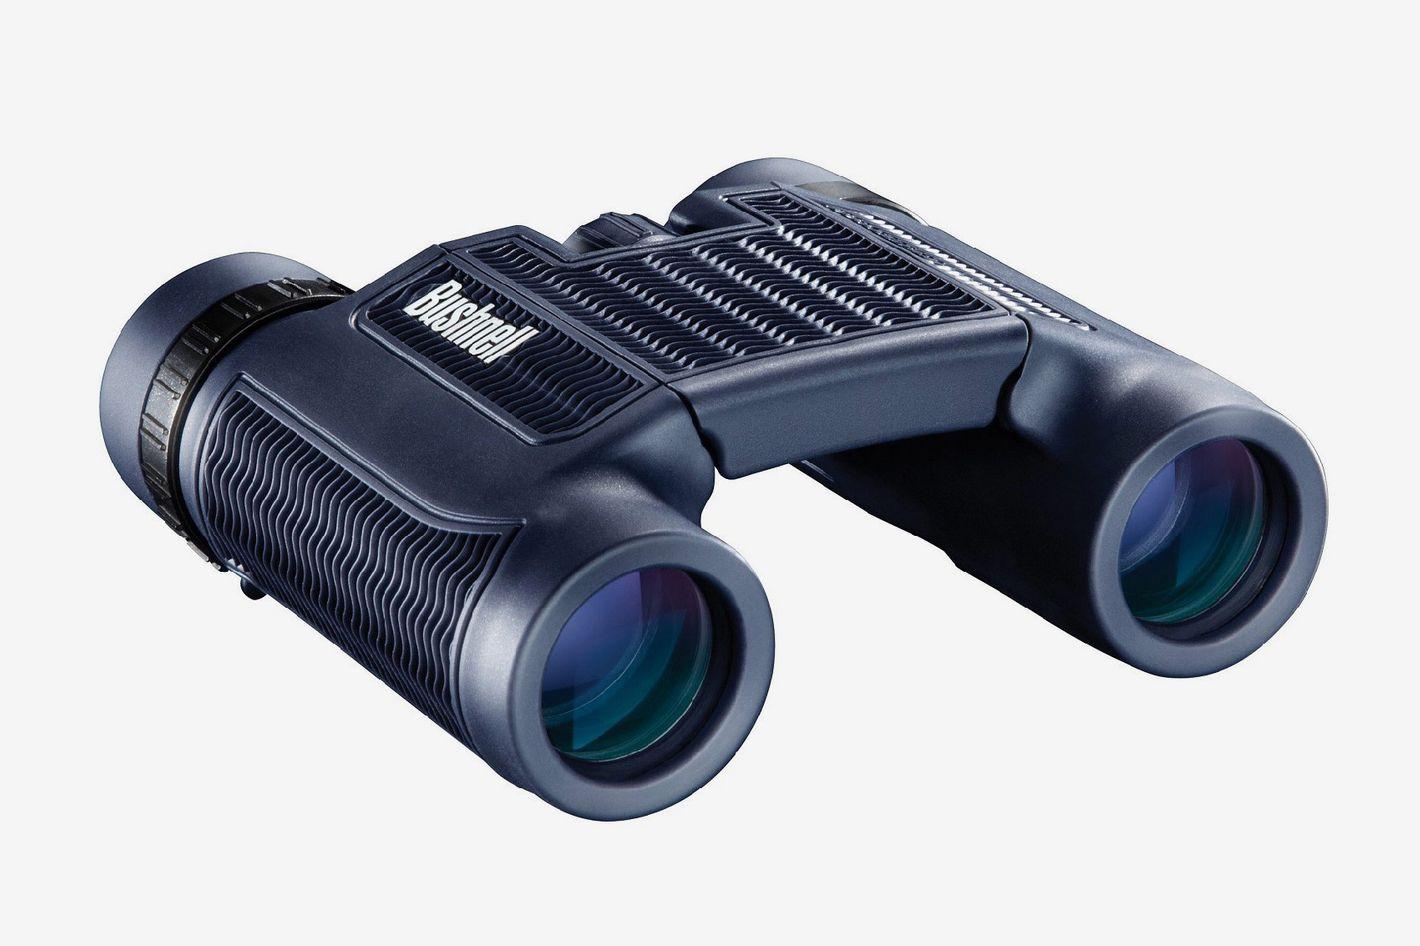 Bushnell H2O Waterproof Binocular 10x25